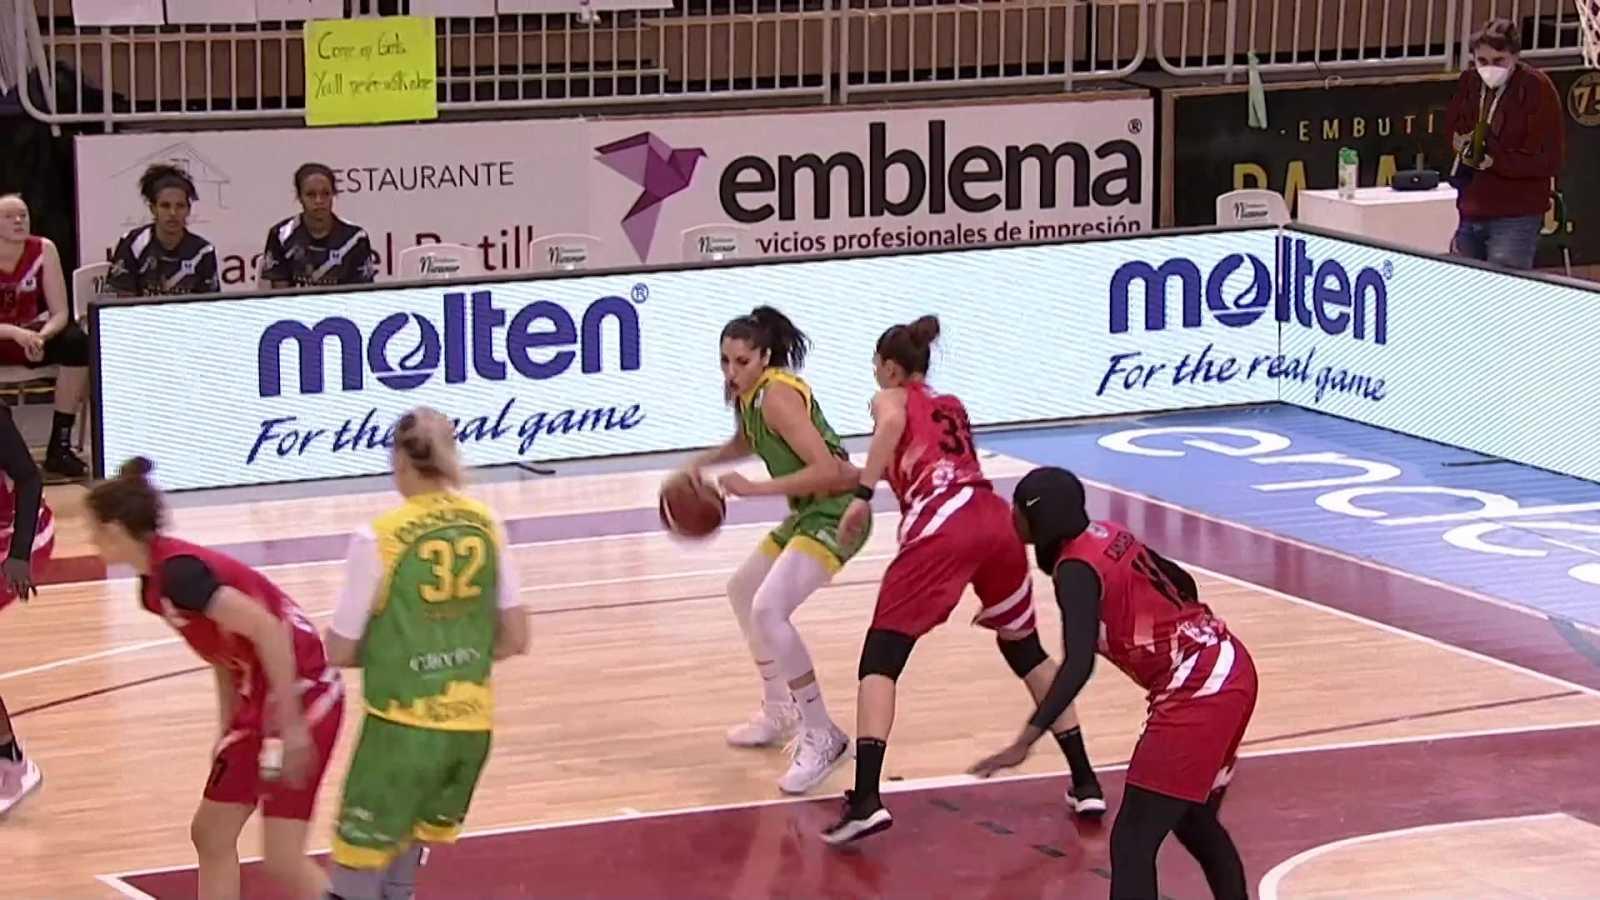 Baloncesto - Liga femenina Endesa. 26ª jornada: Embutidos Pajariel Bembibre - Alter Enersun Al-Qazeres - ver ahora